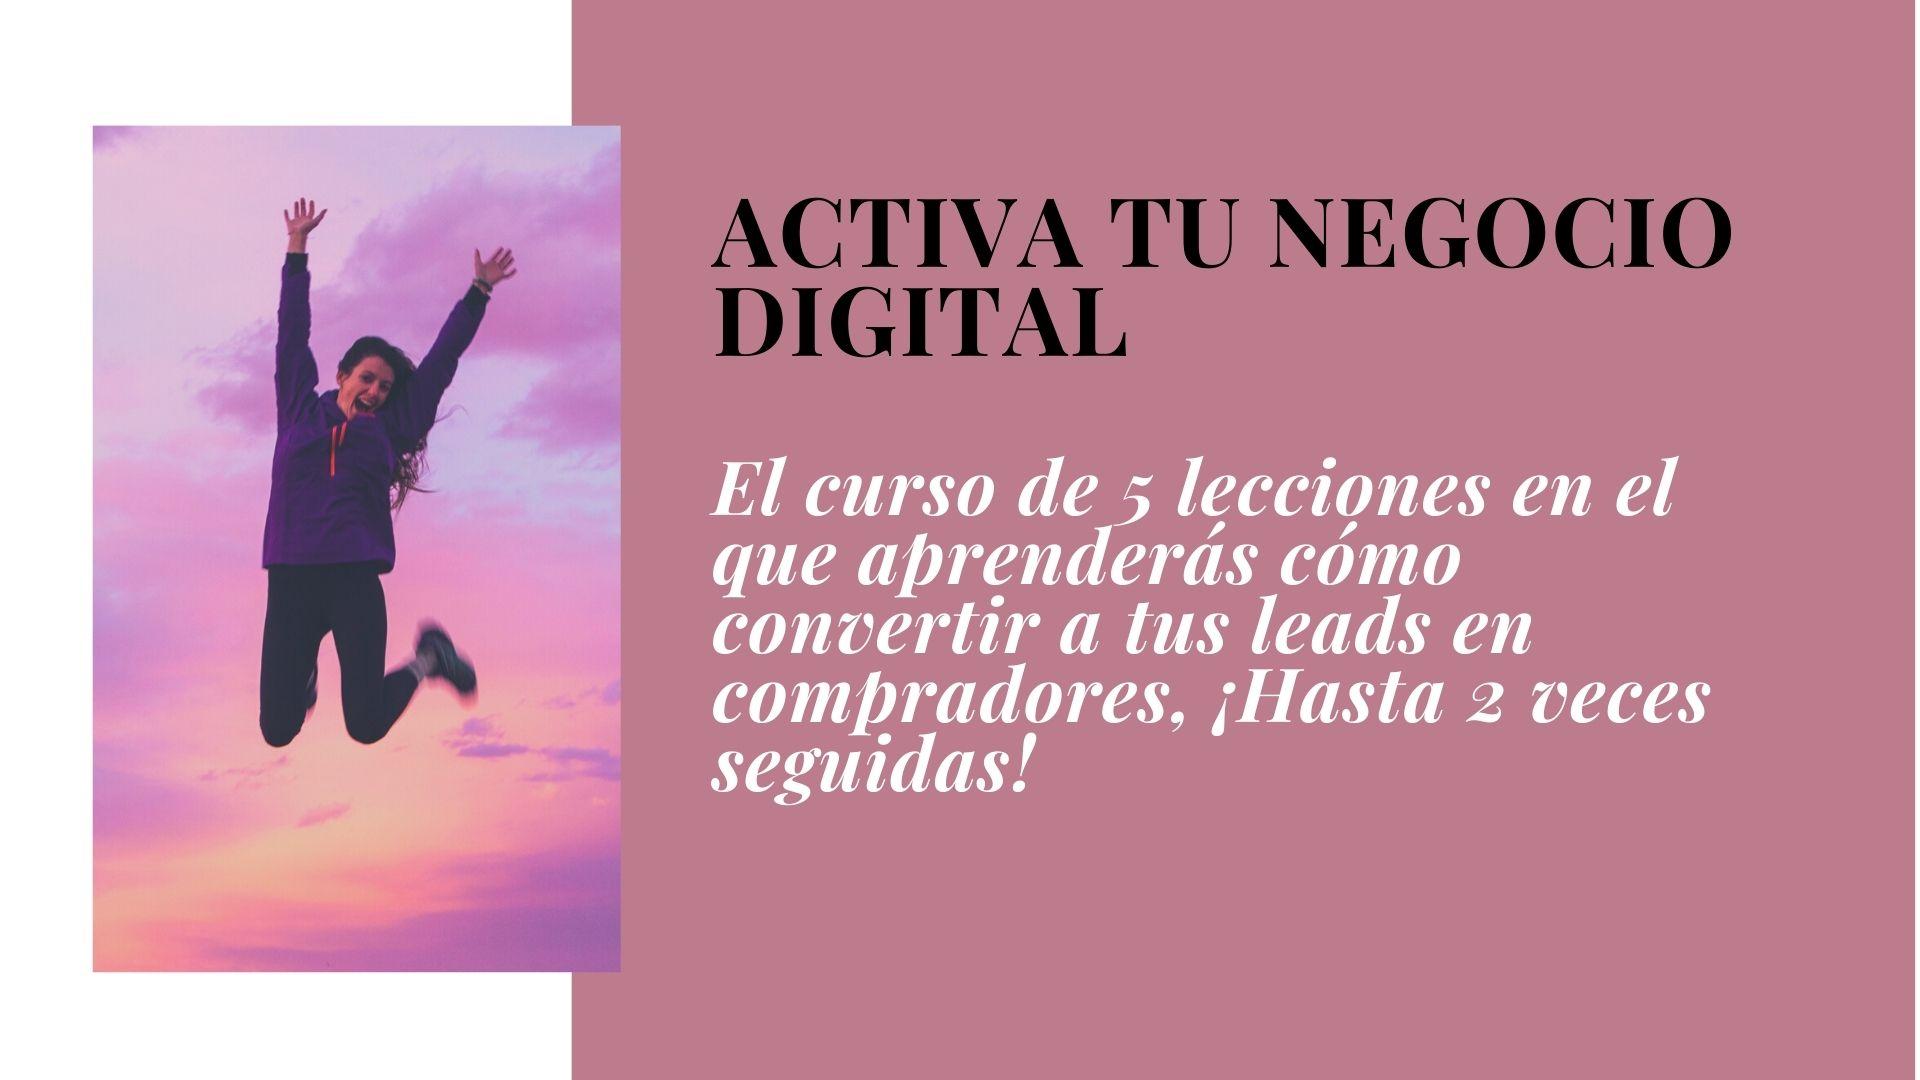 tripwire activa tu negocio digital